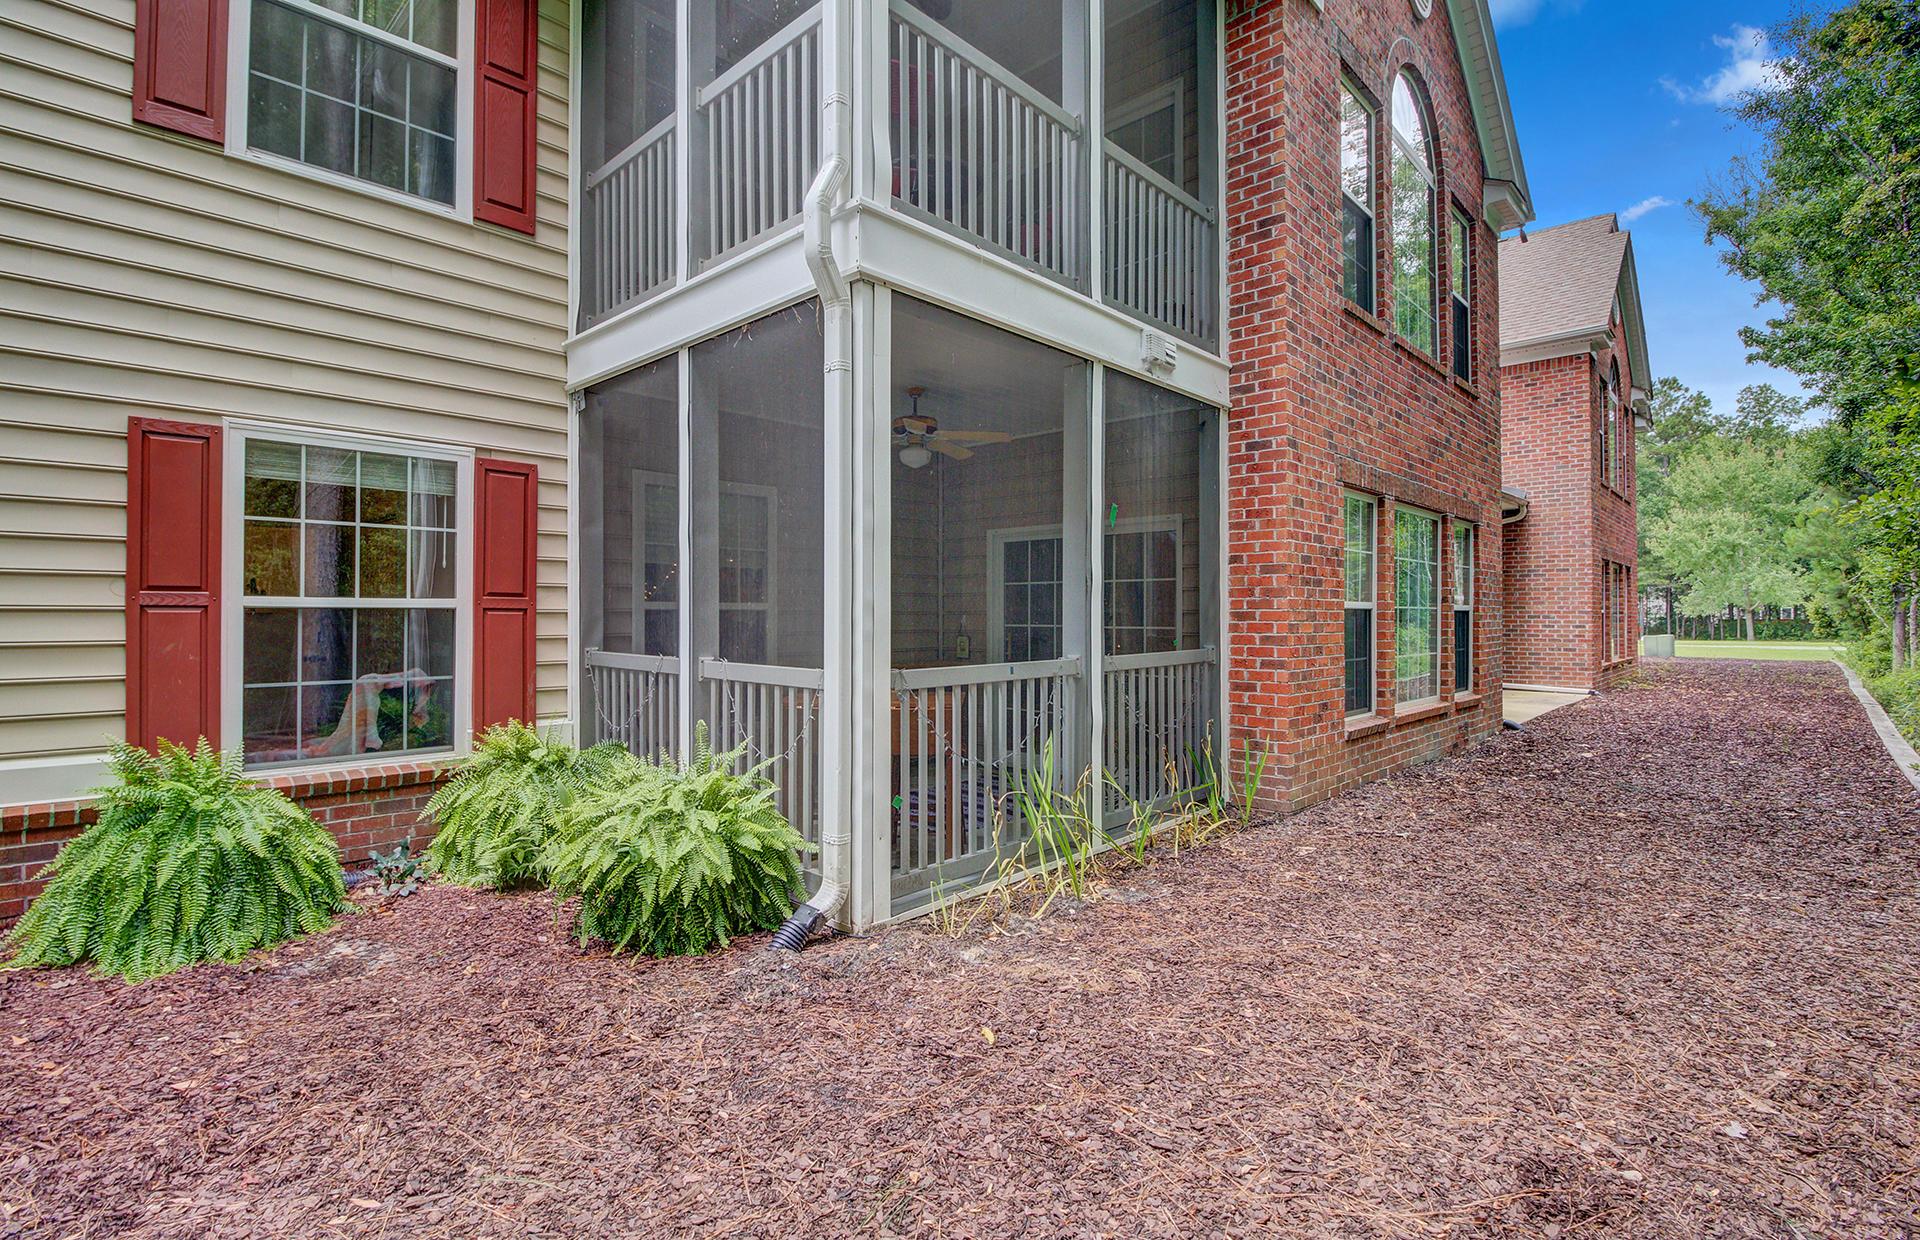 Dunes West Homes For Sale - 1566 Oxborough, Mount Pleasant, SC - 11